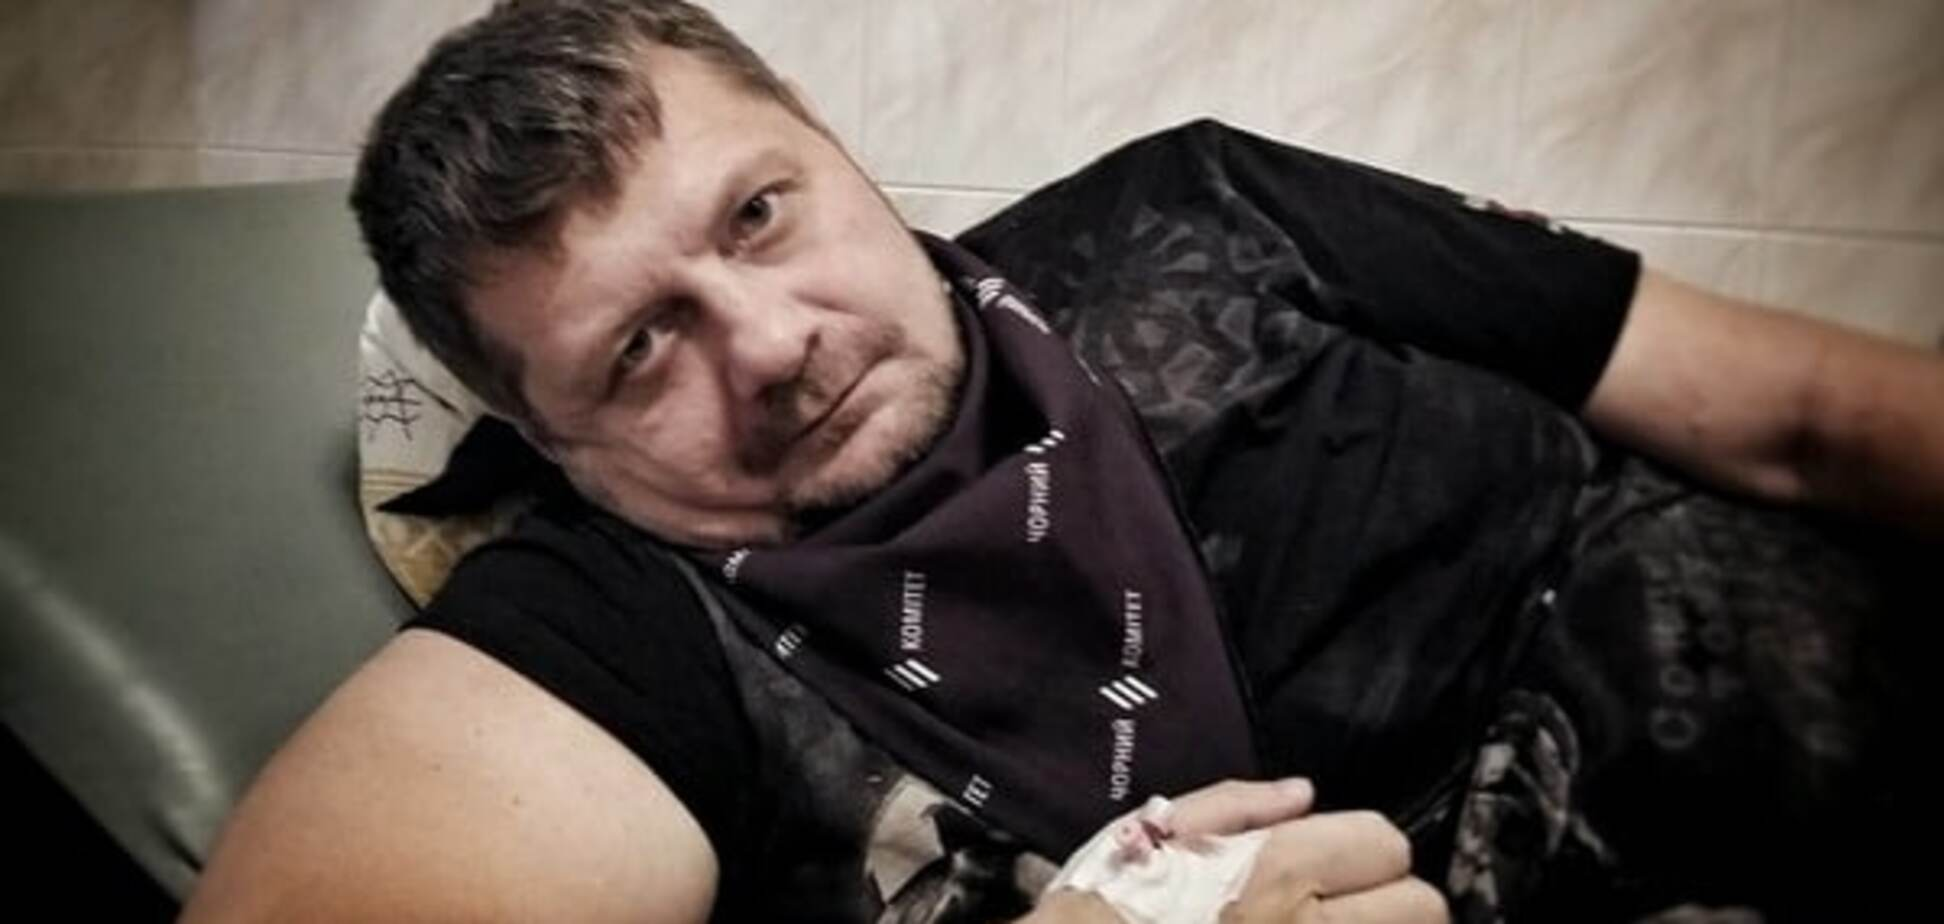 Врачи оставили Мосийчука в реанимации: обширная язва желудка и кровотечение